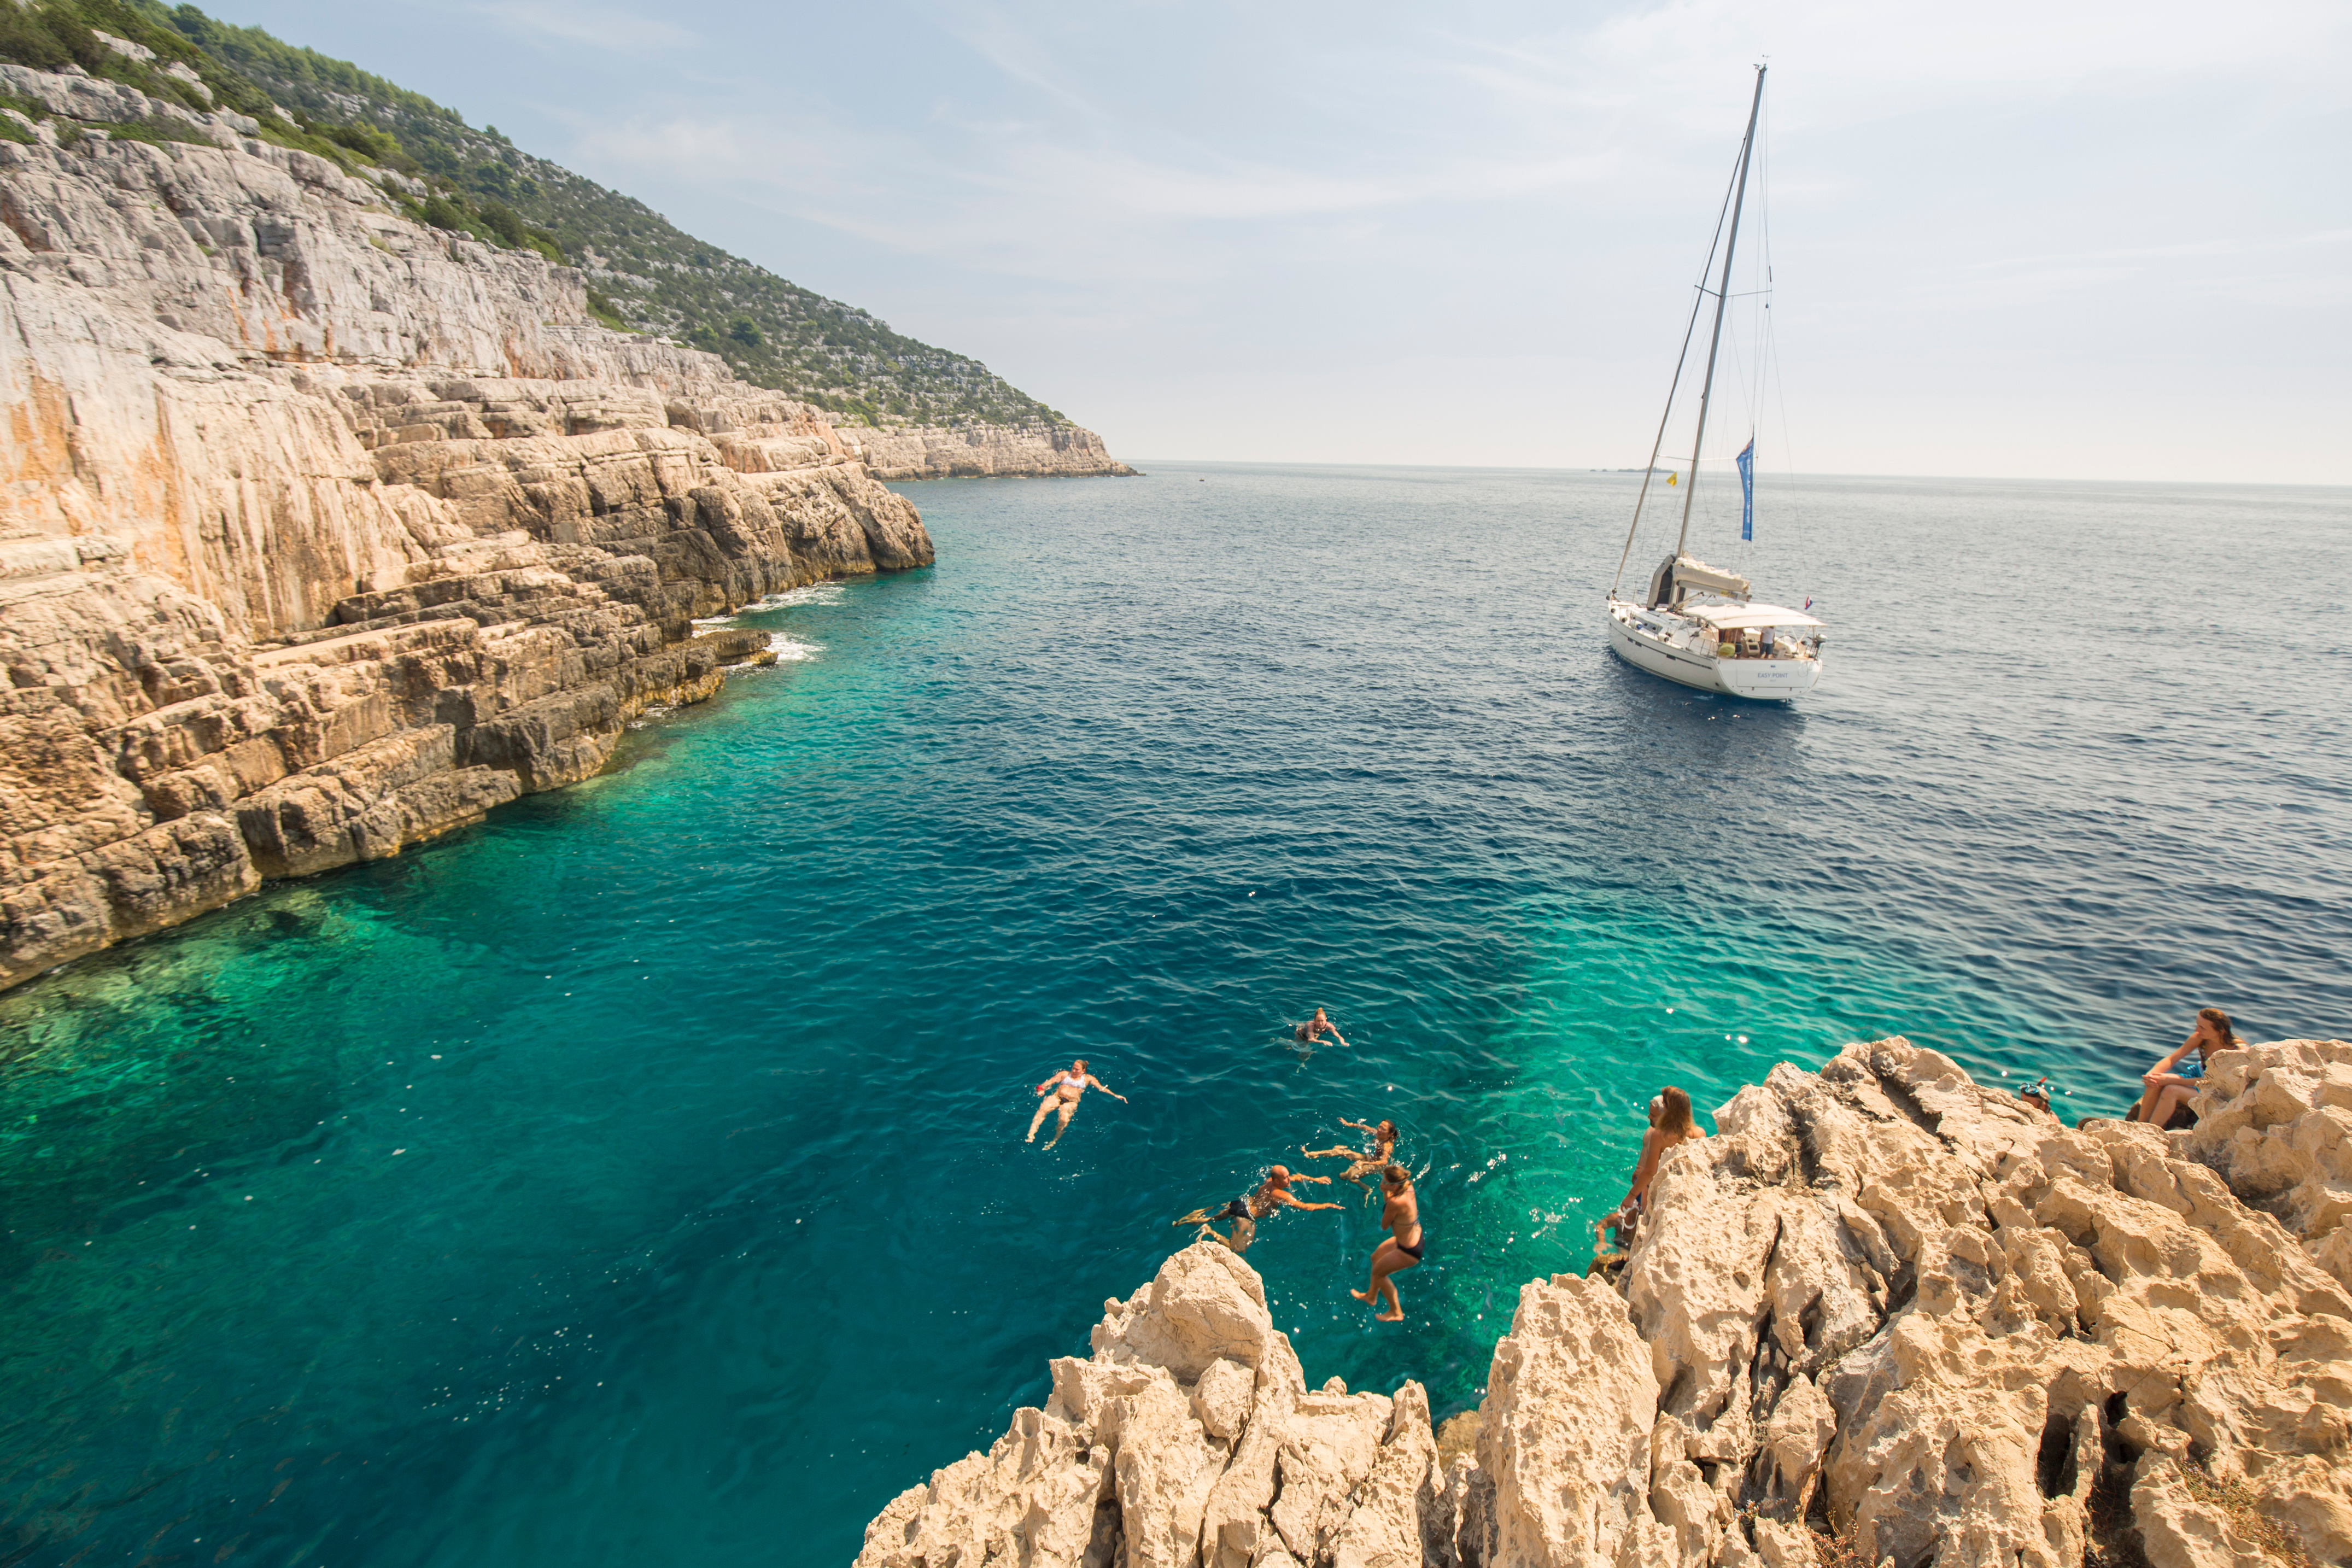 A boat in Mjlet island, Croatia